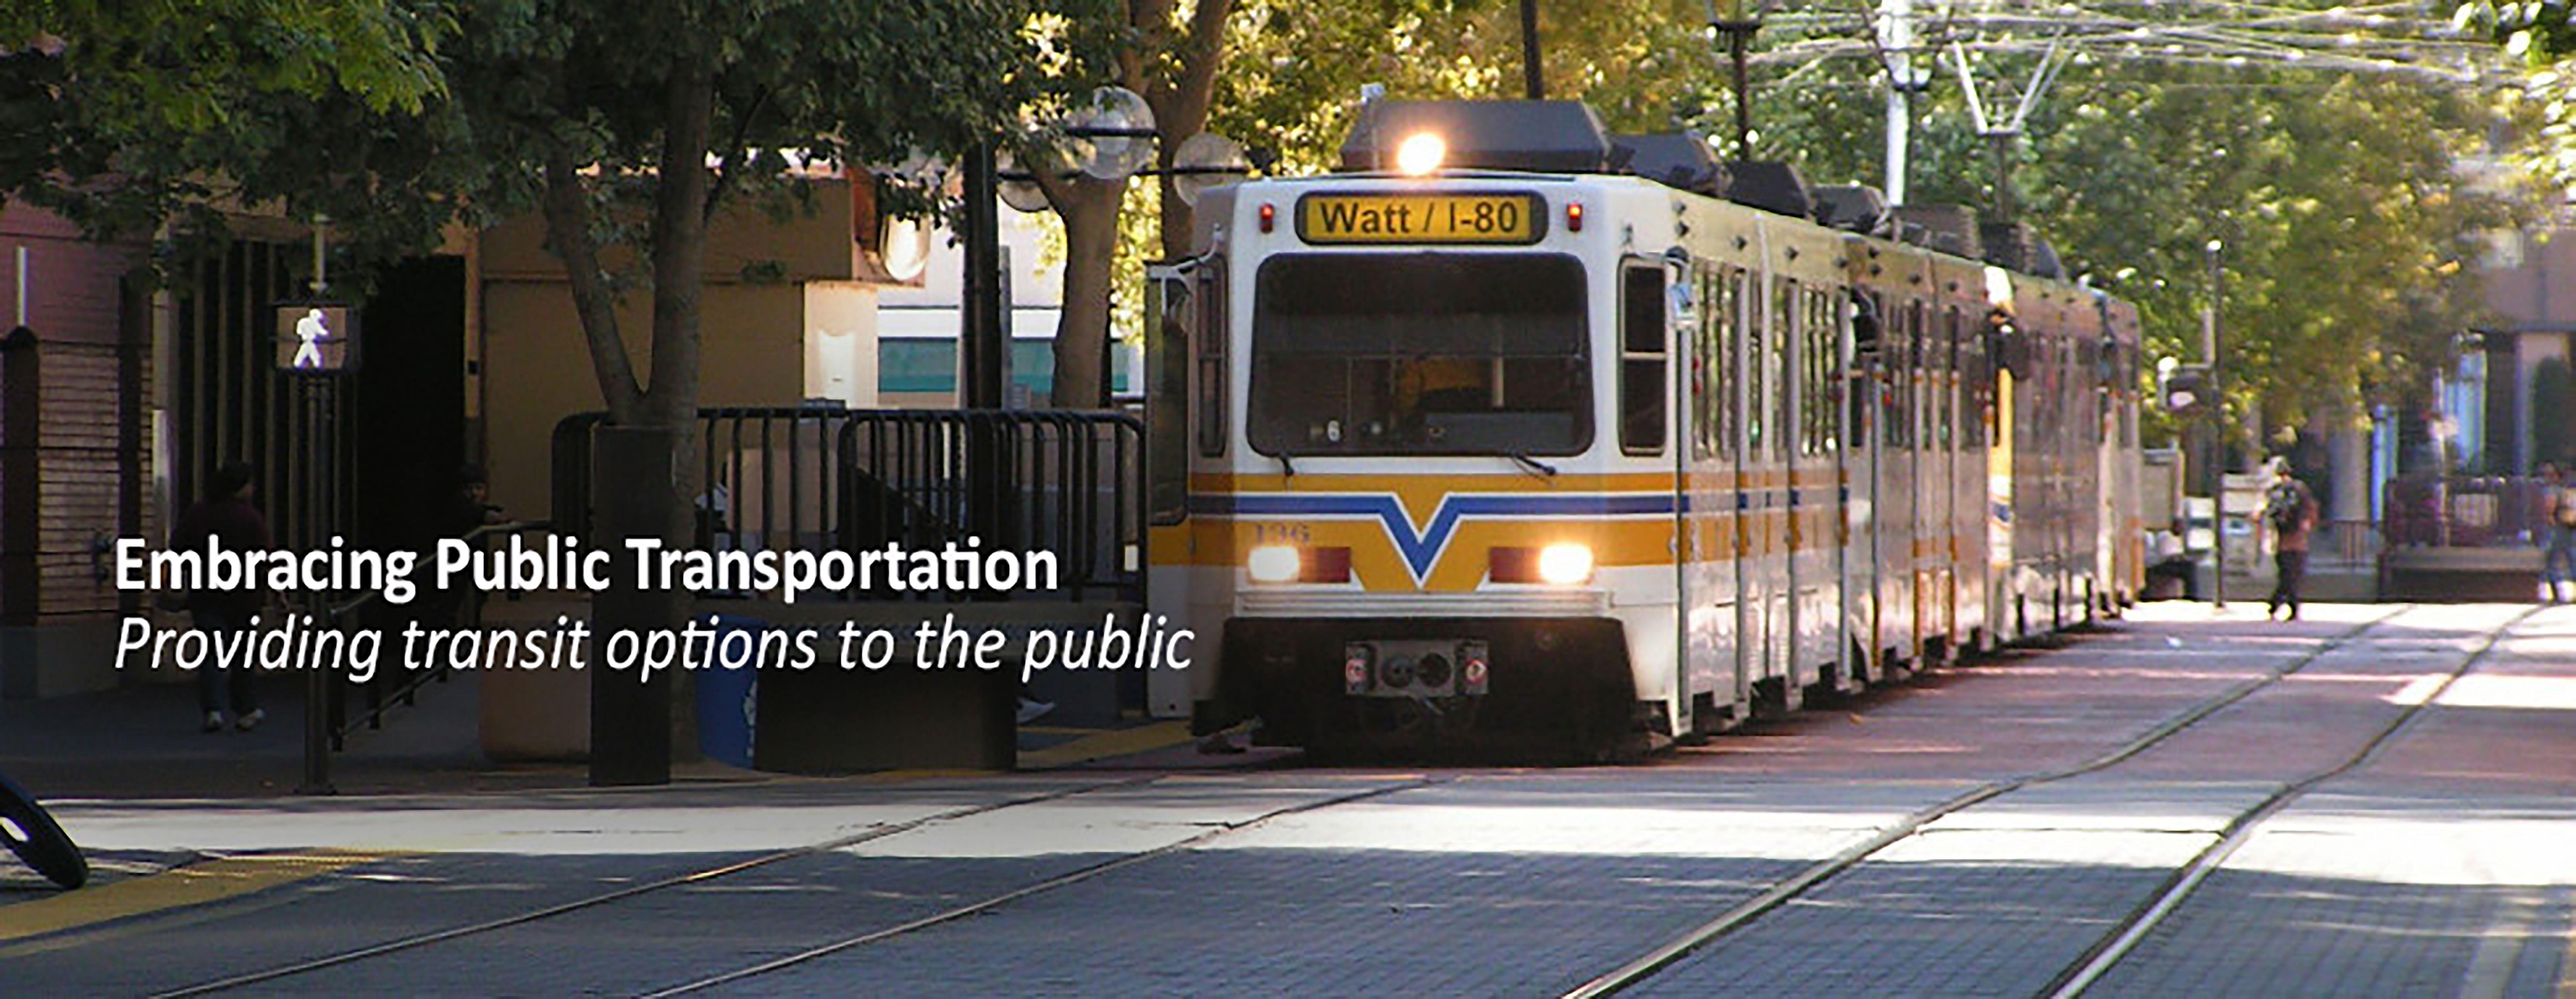 Walk Sacramento discussing various transportation